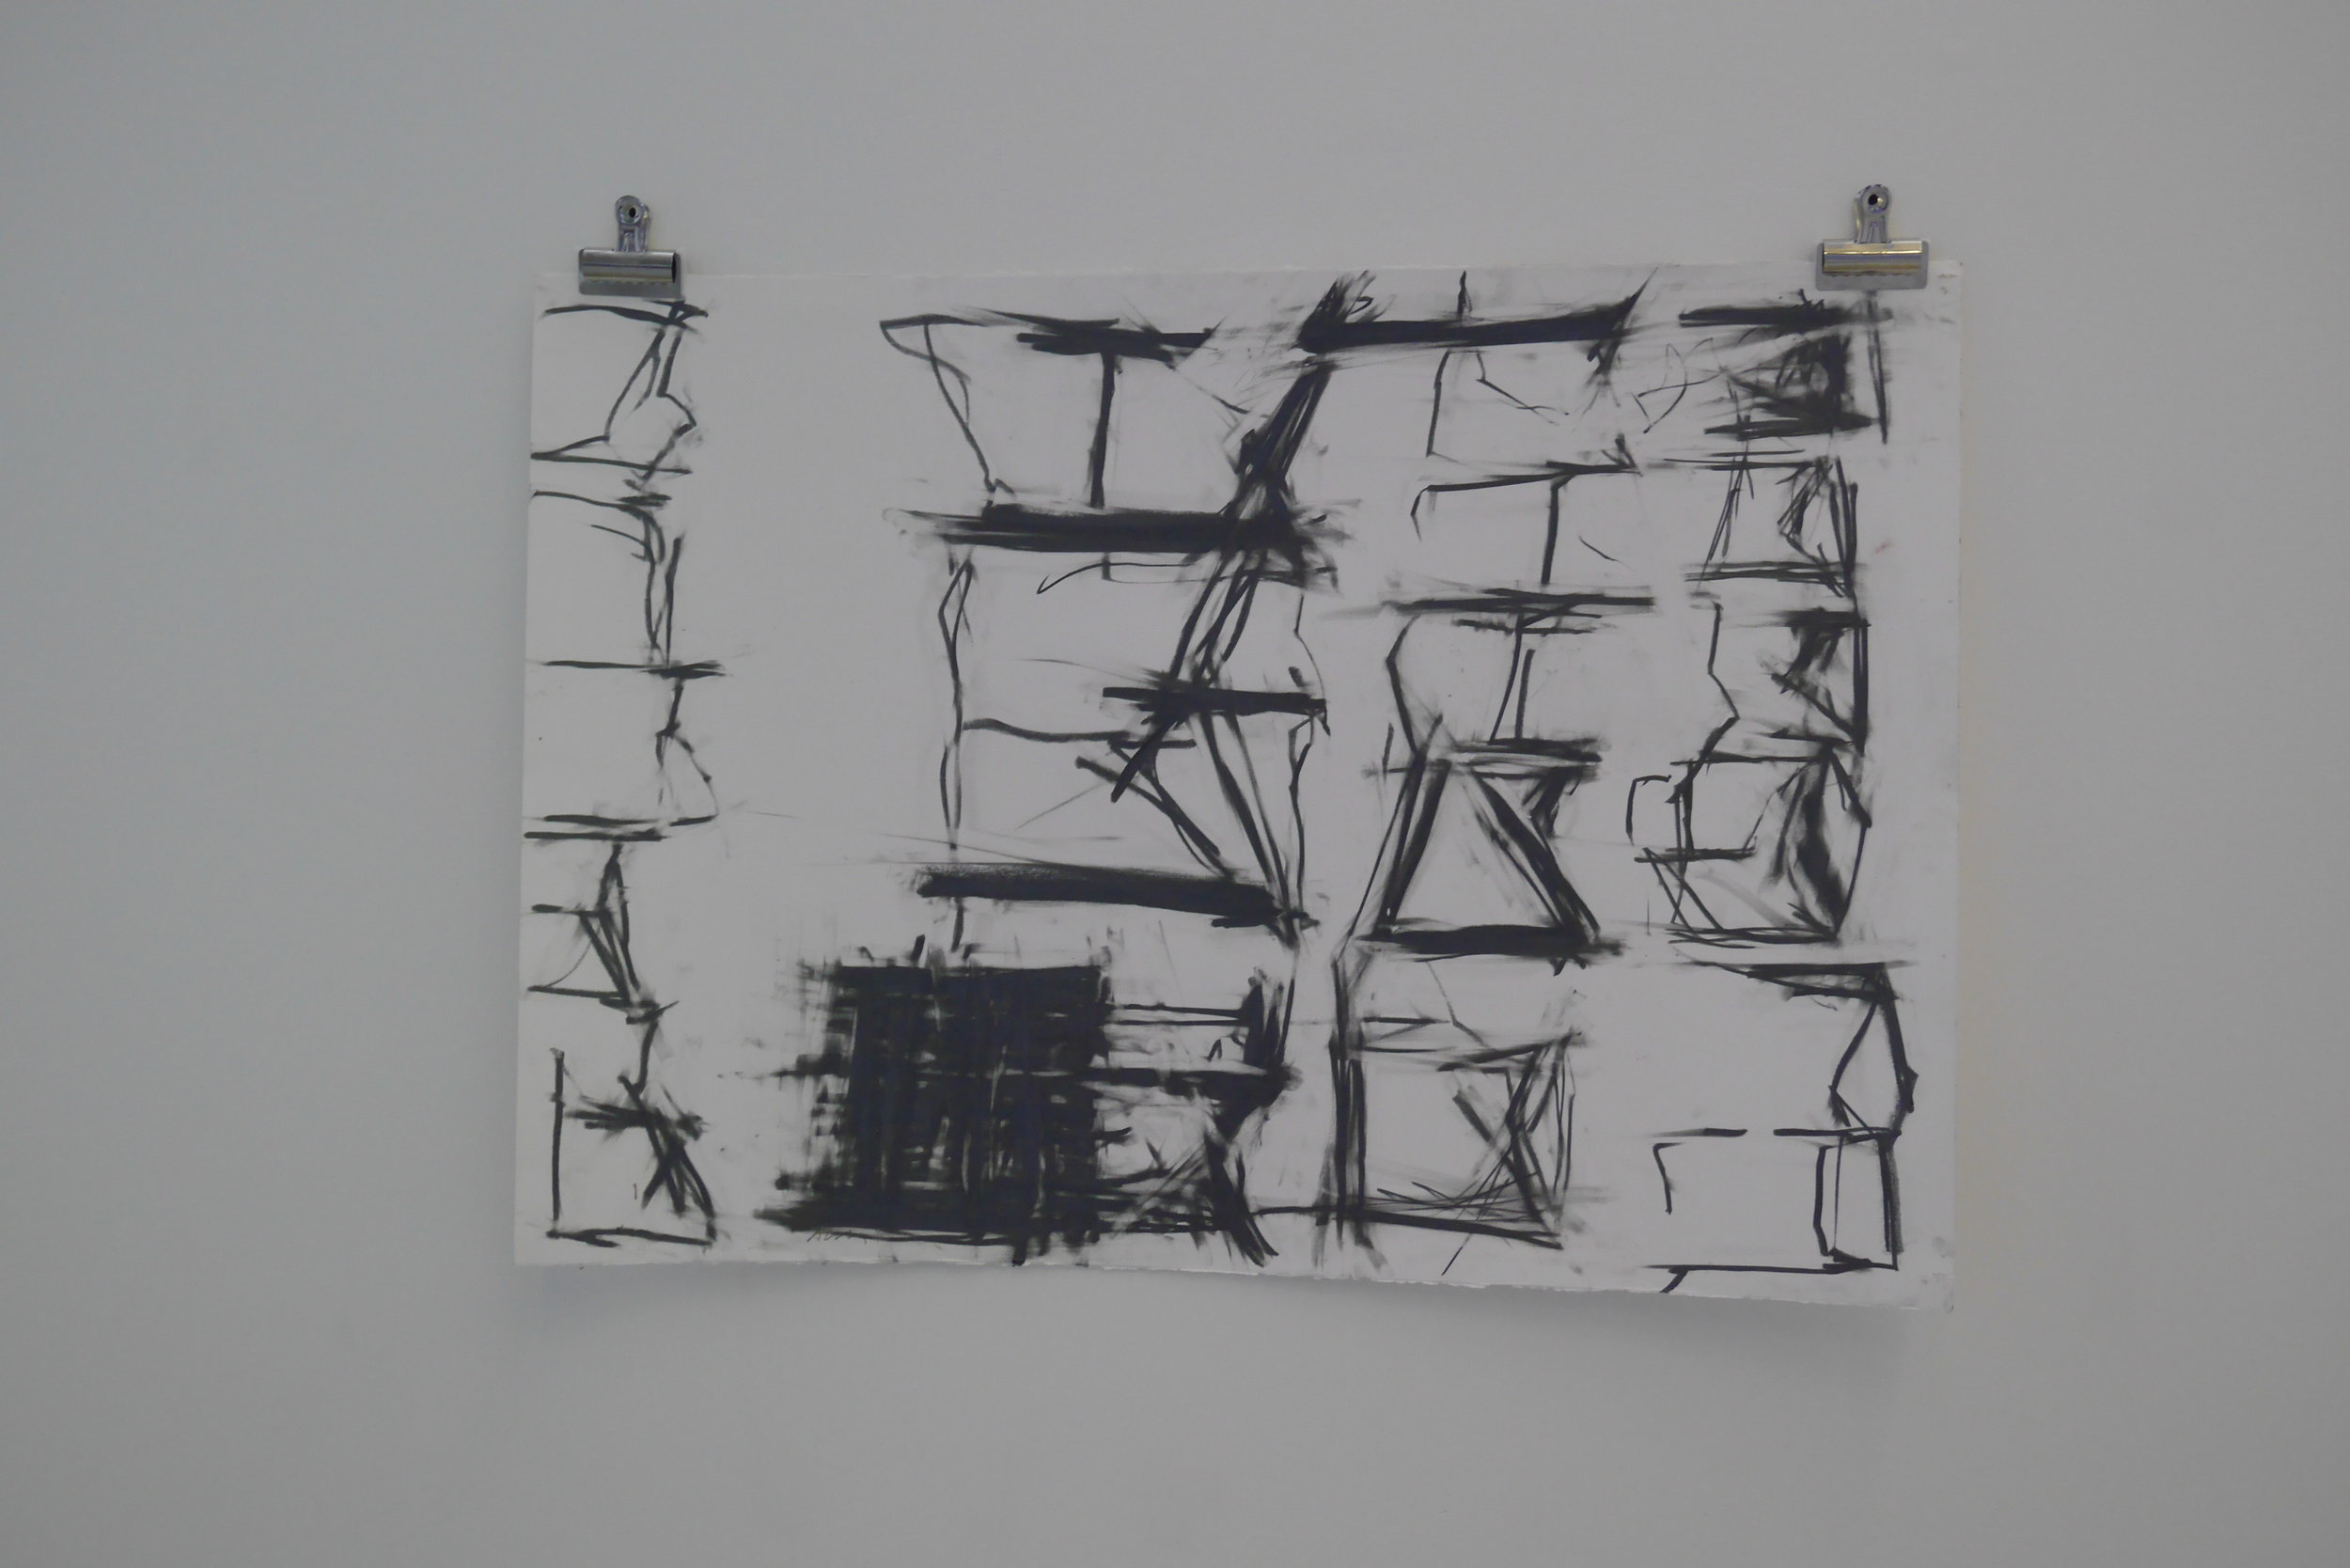 David Alban, Fragments 1